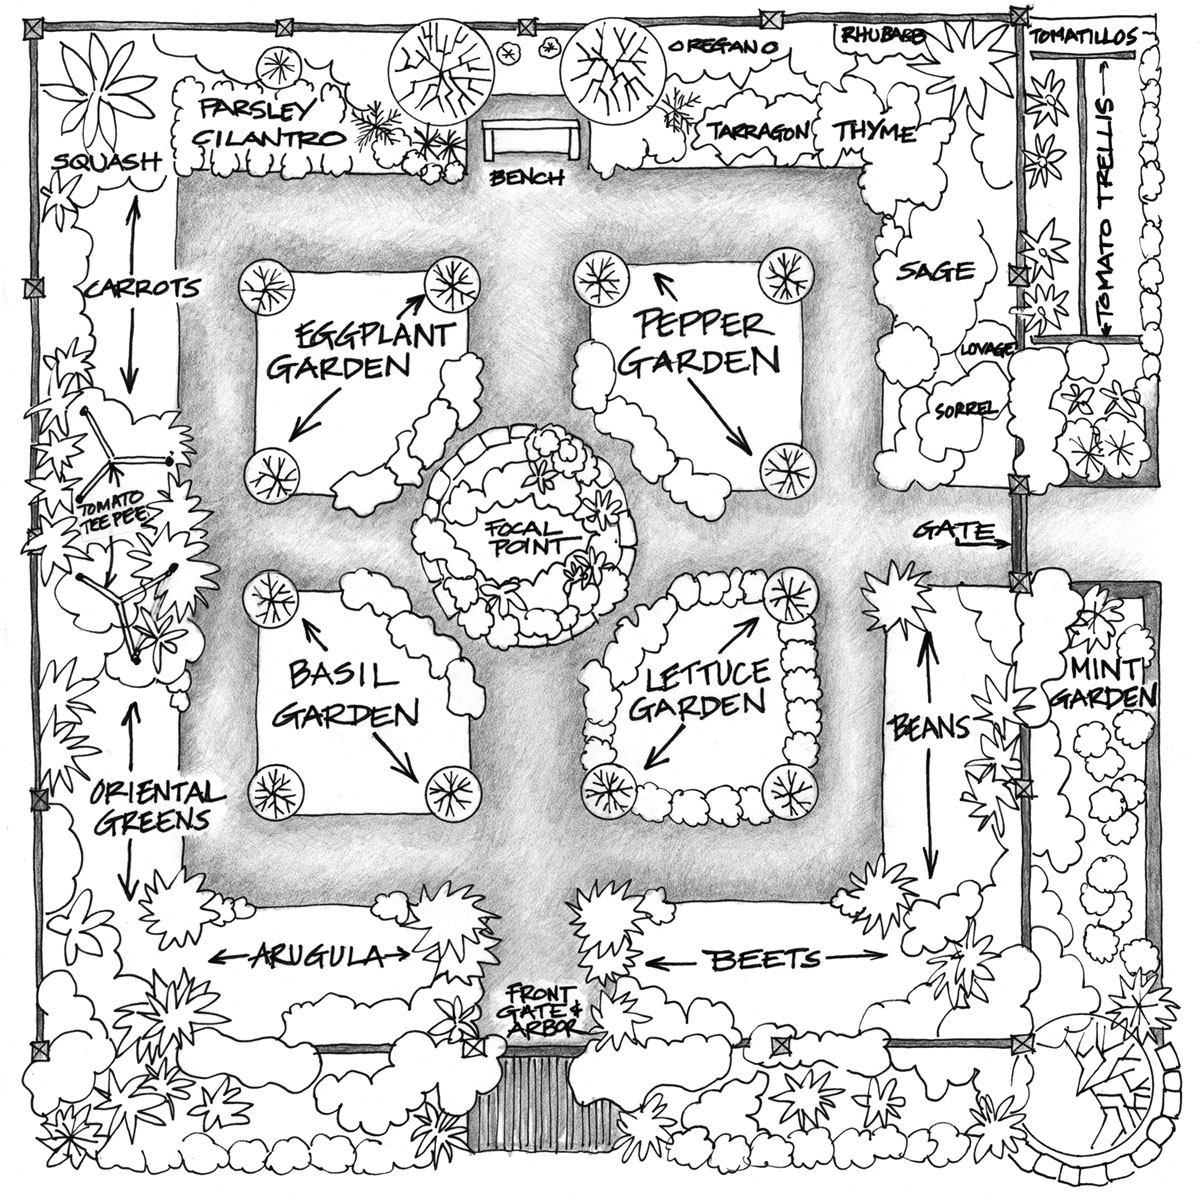 Permaculture Garden Design permaculture conceptual_plan Permaculture Vegetable Garden Design Qzys